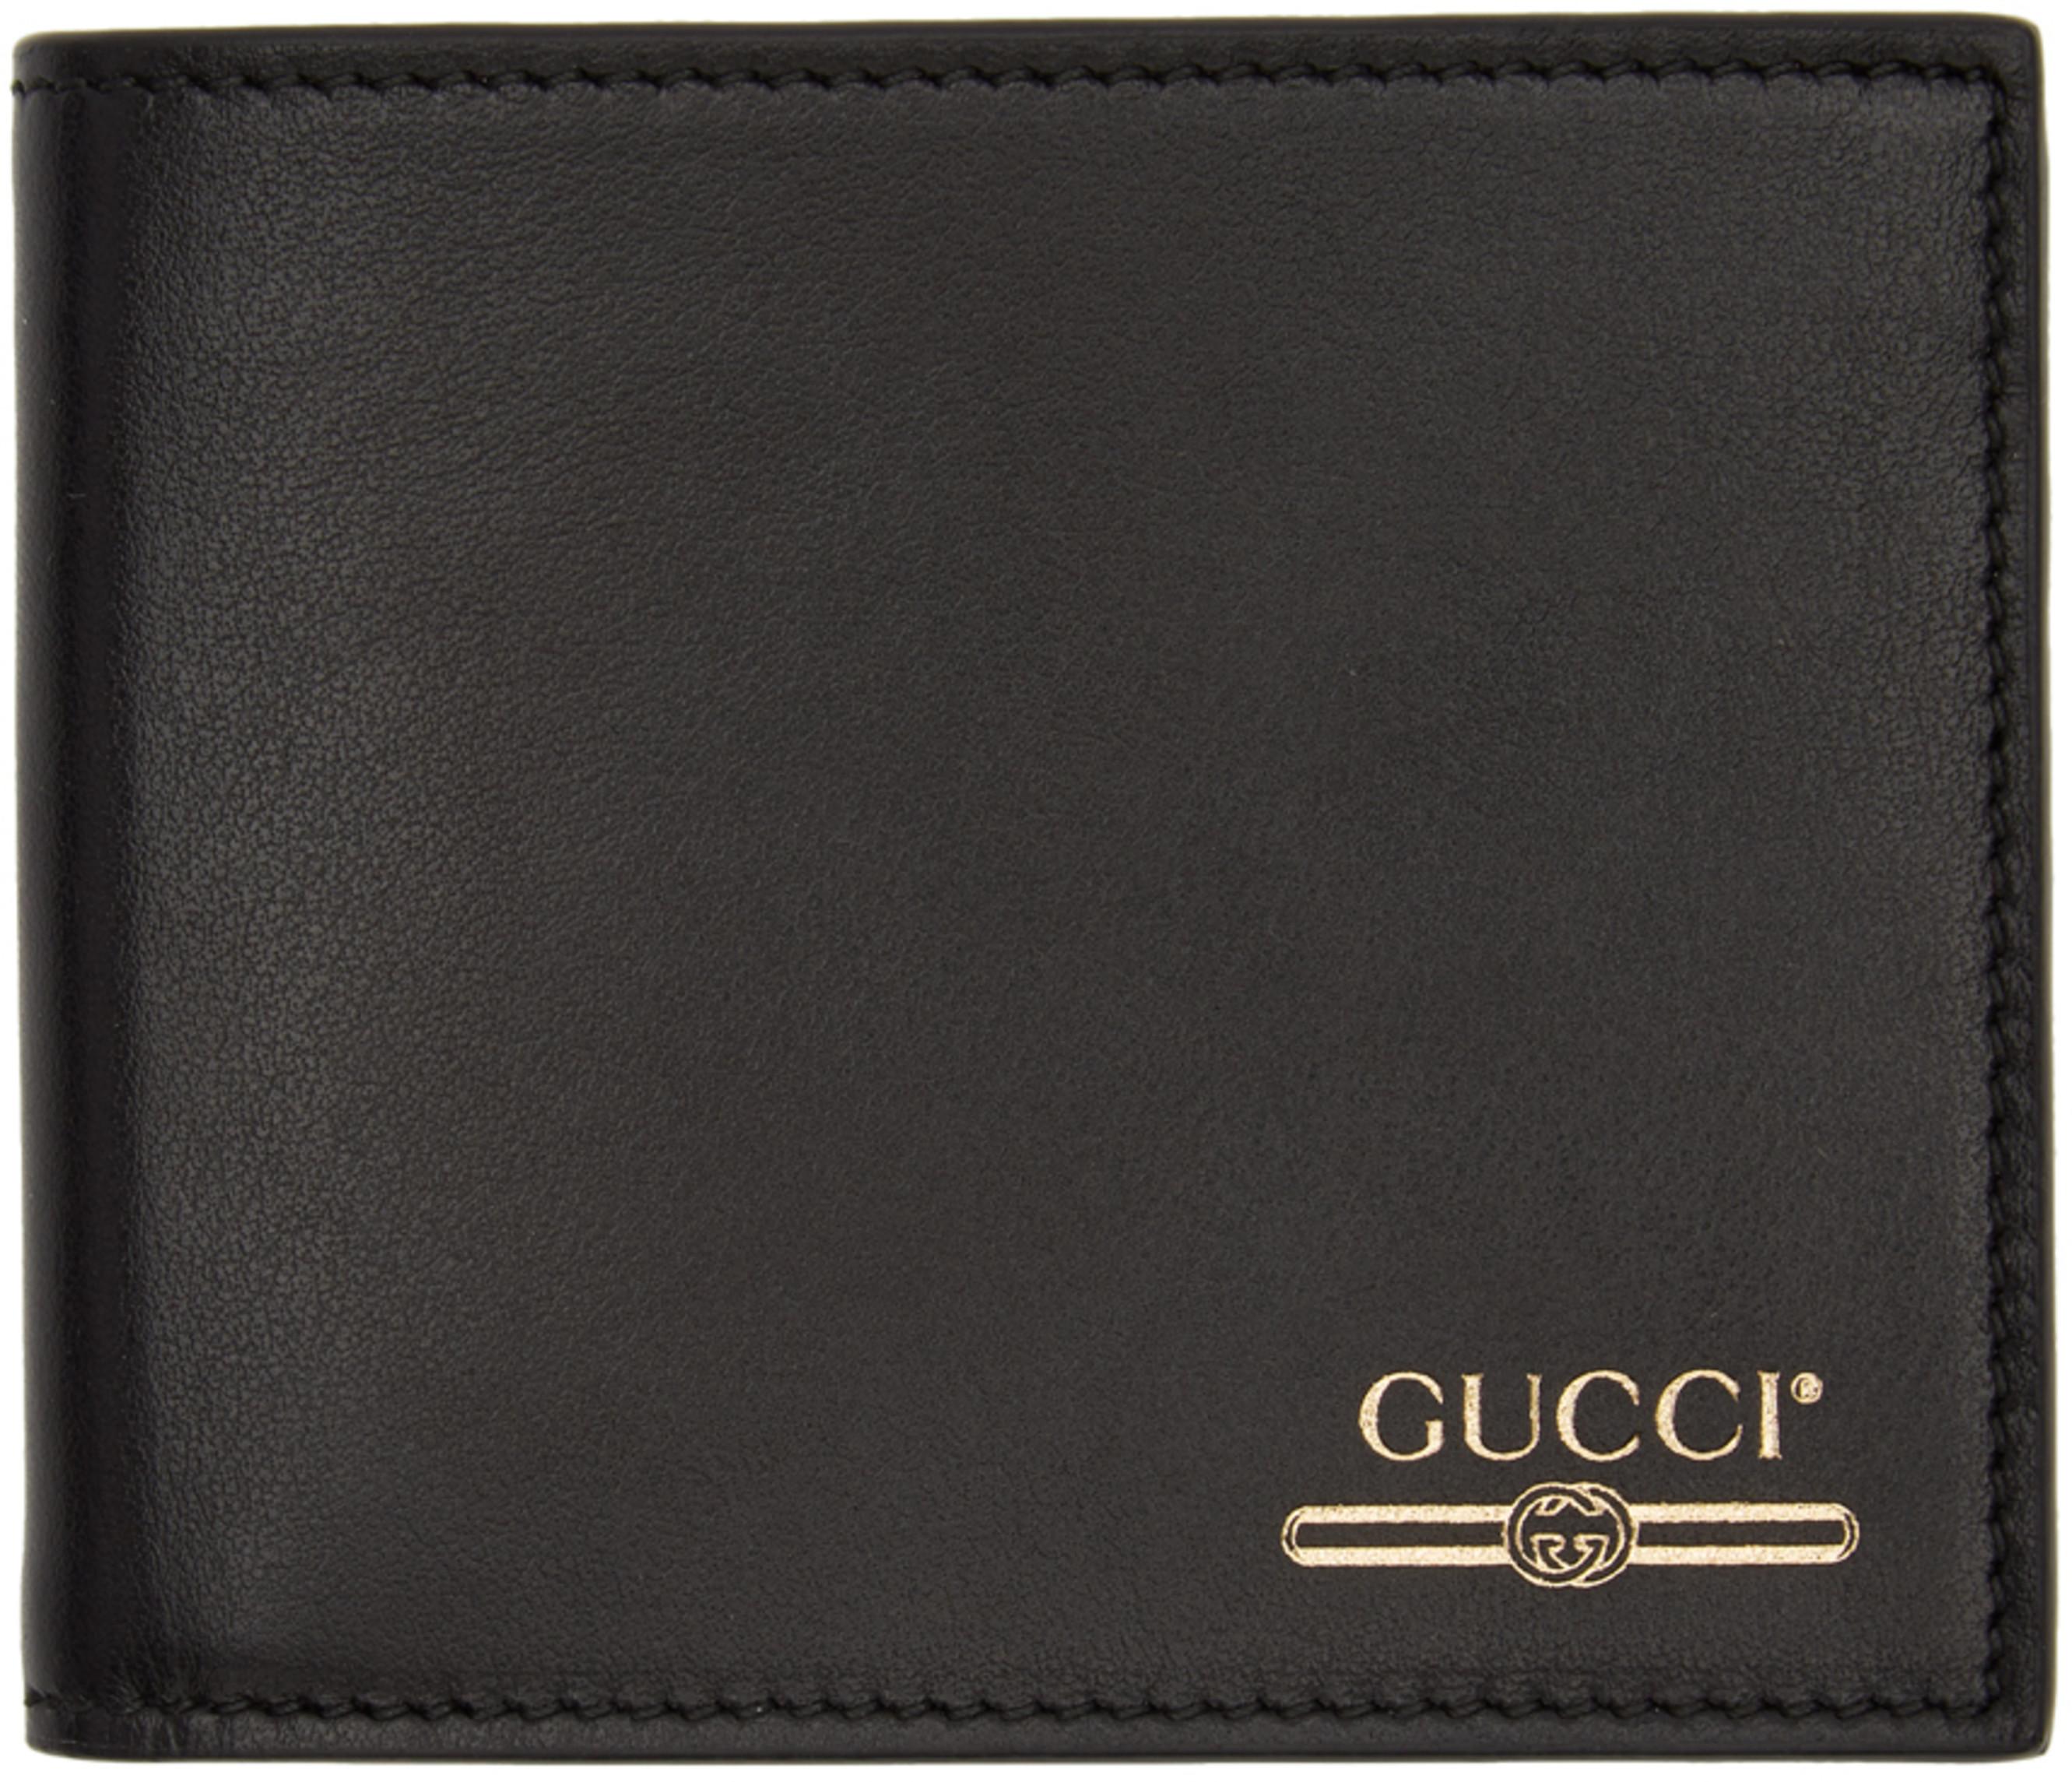 a50a4e0a07a262 Gucci wallets & card holders for Men   SSENSE